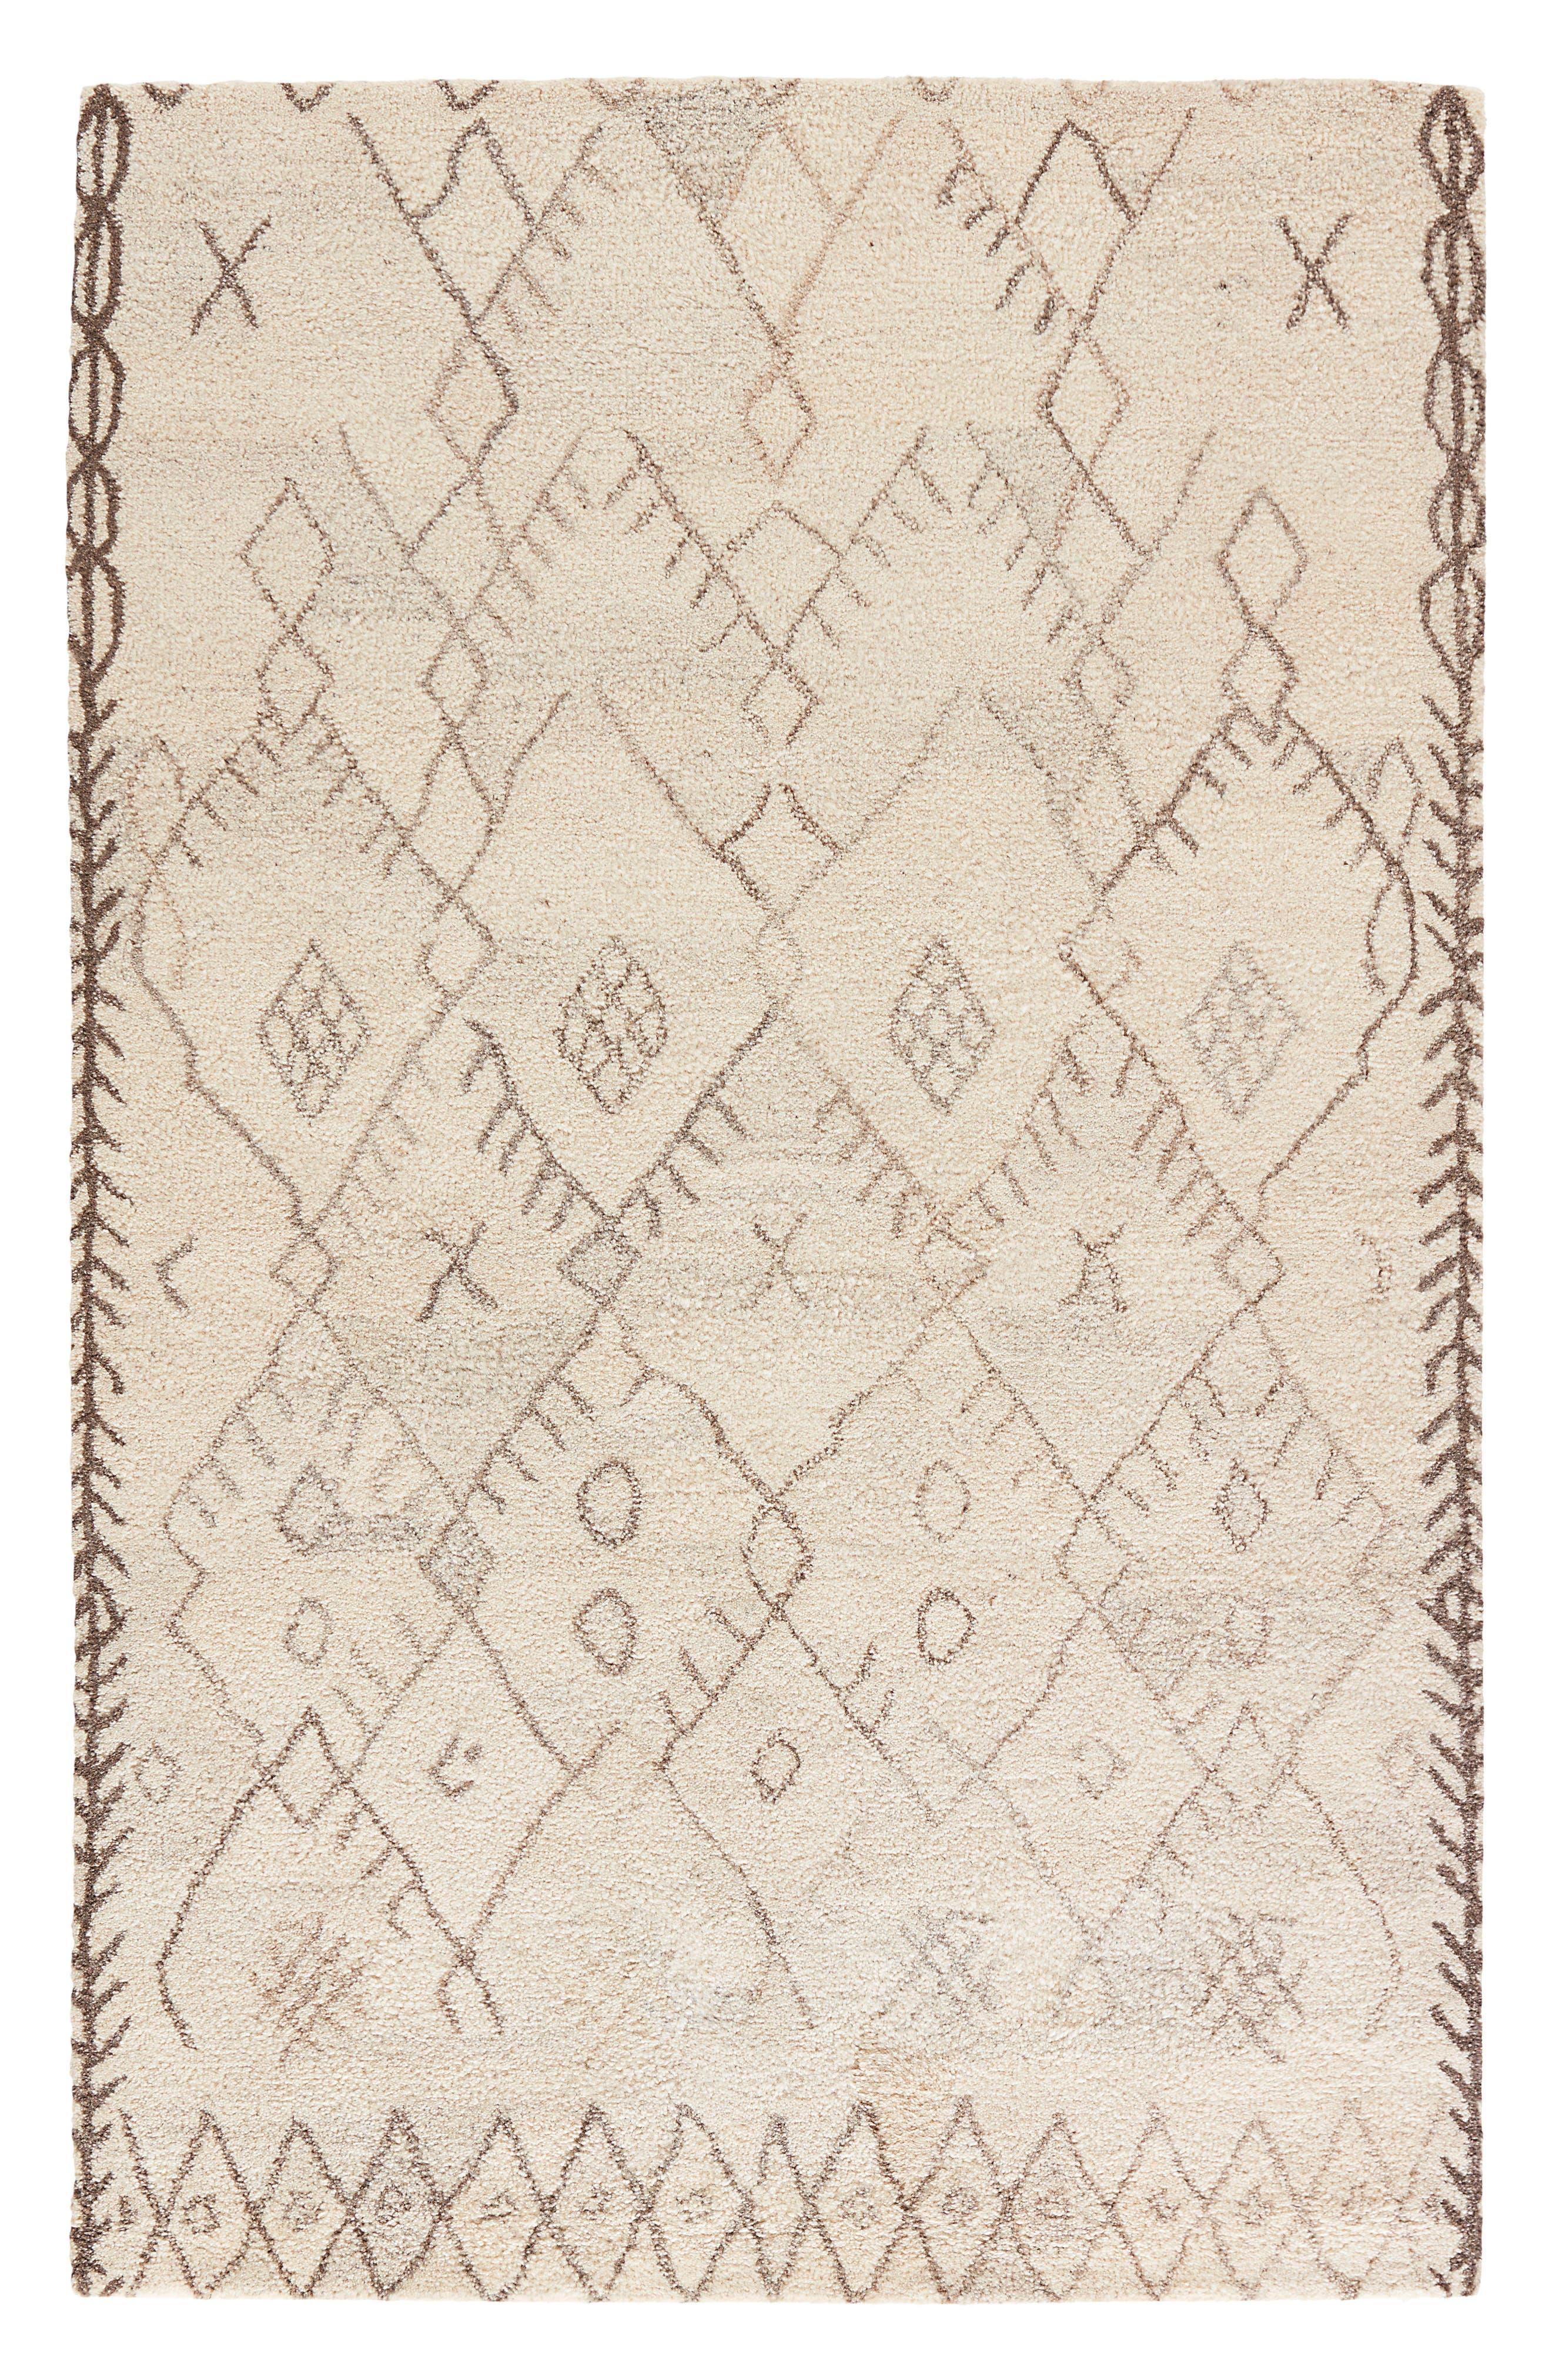 Geo Pattern Wool Rug,                             Main thumbnail 1, color,                             250